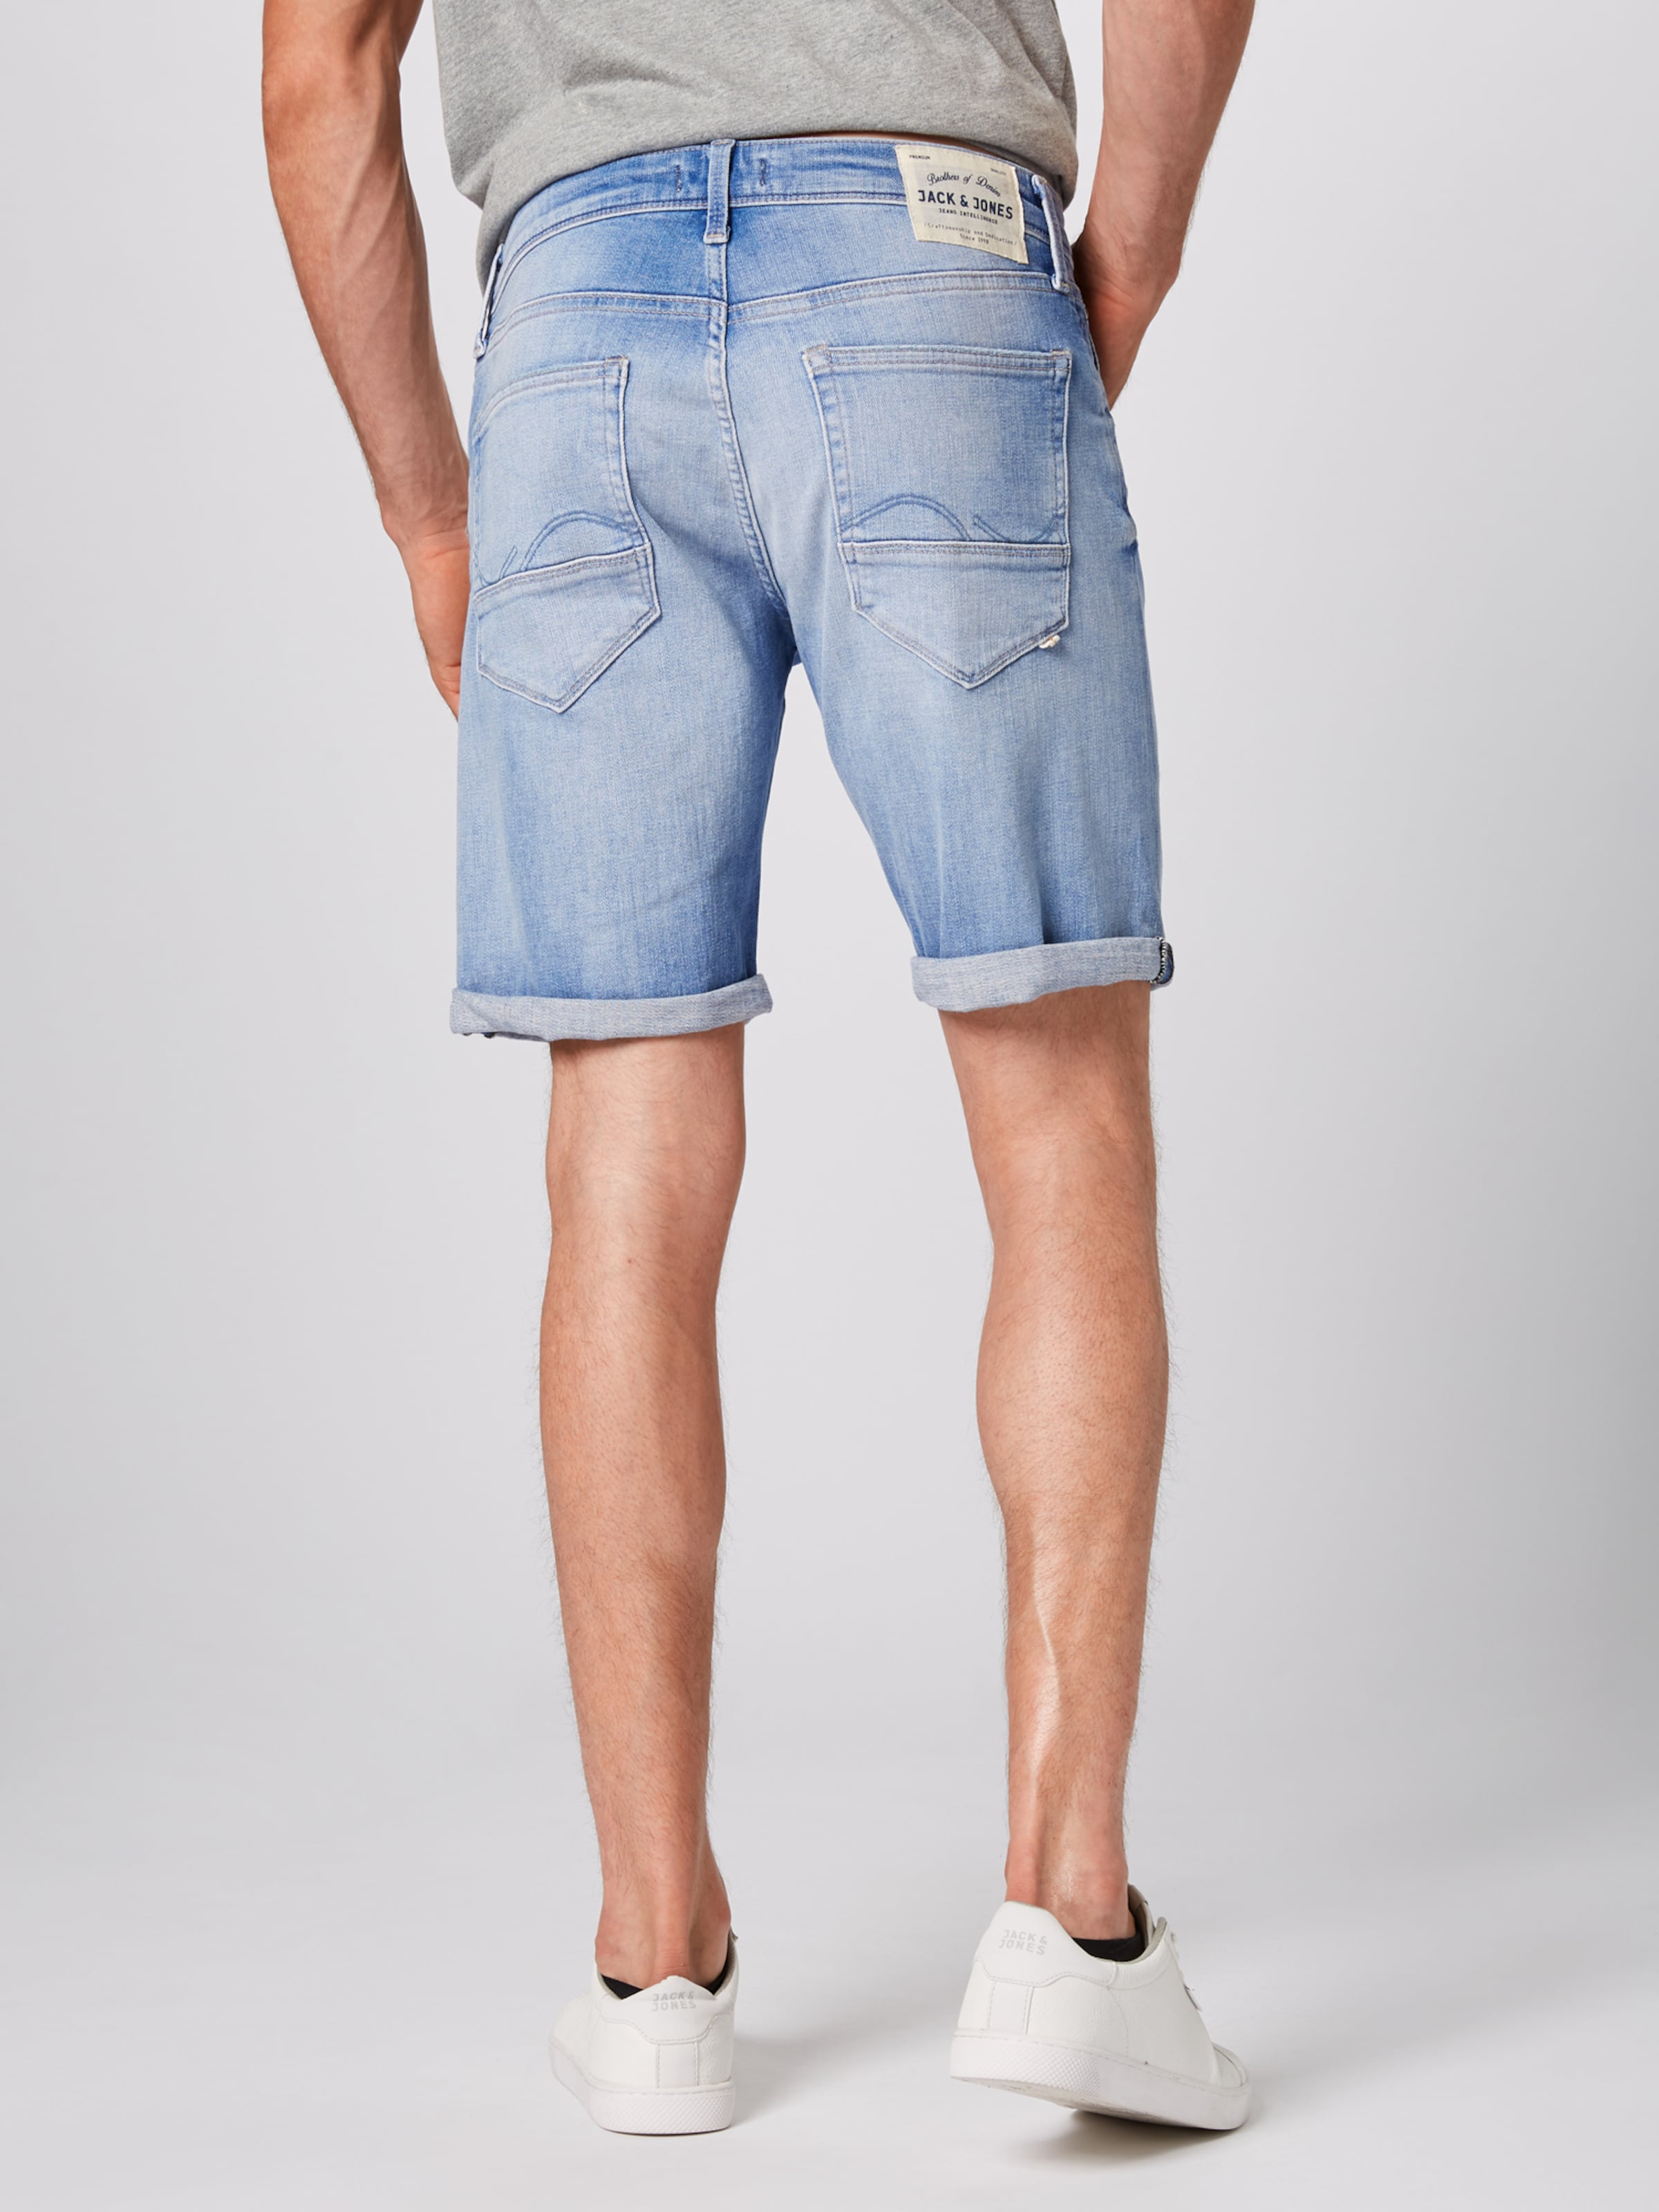 Jeans 'irick In Jones Jackamp; Jjfox' Blue Denim ZkPXiu